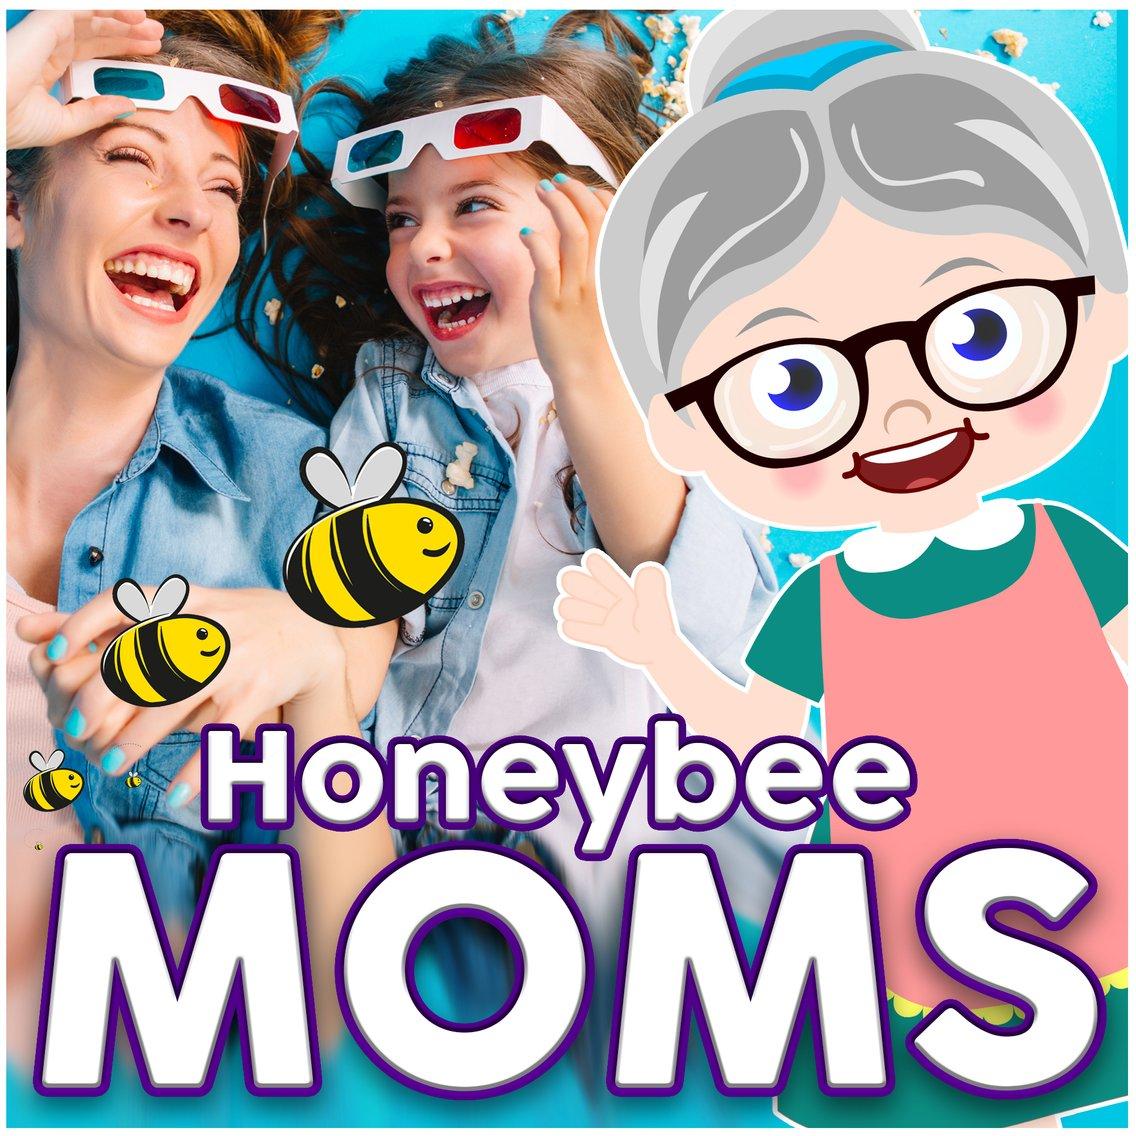 Honeybee Moms - immagine di copertina